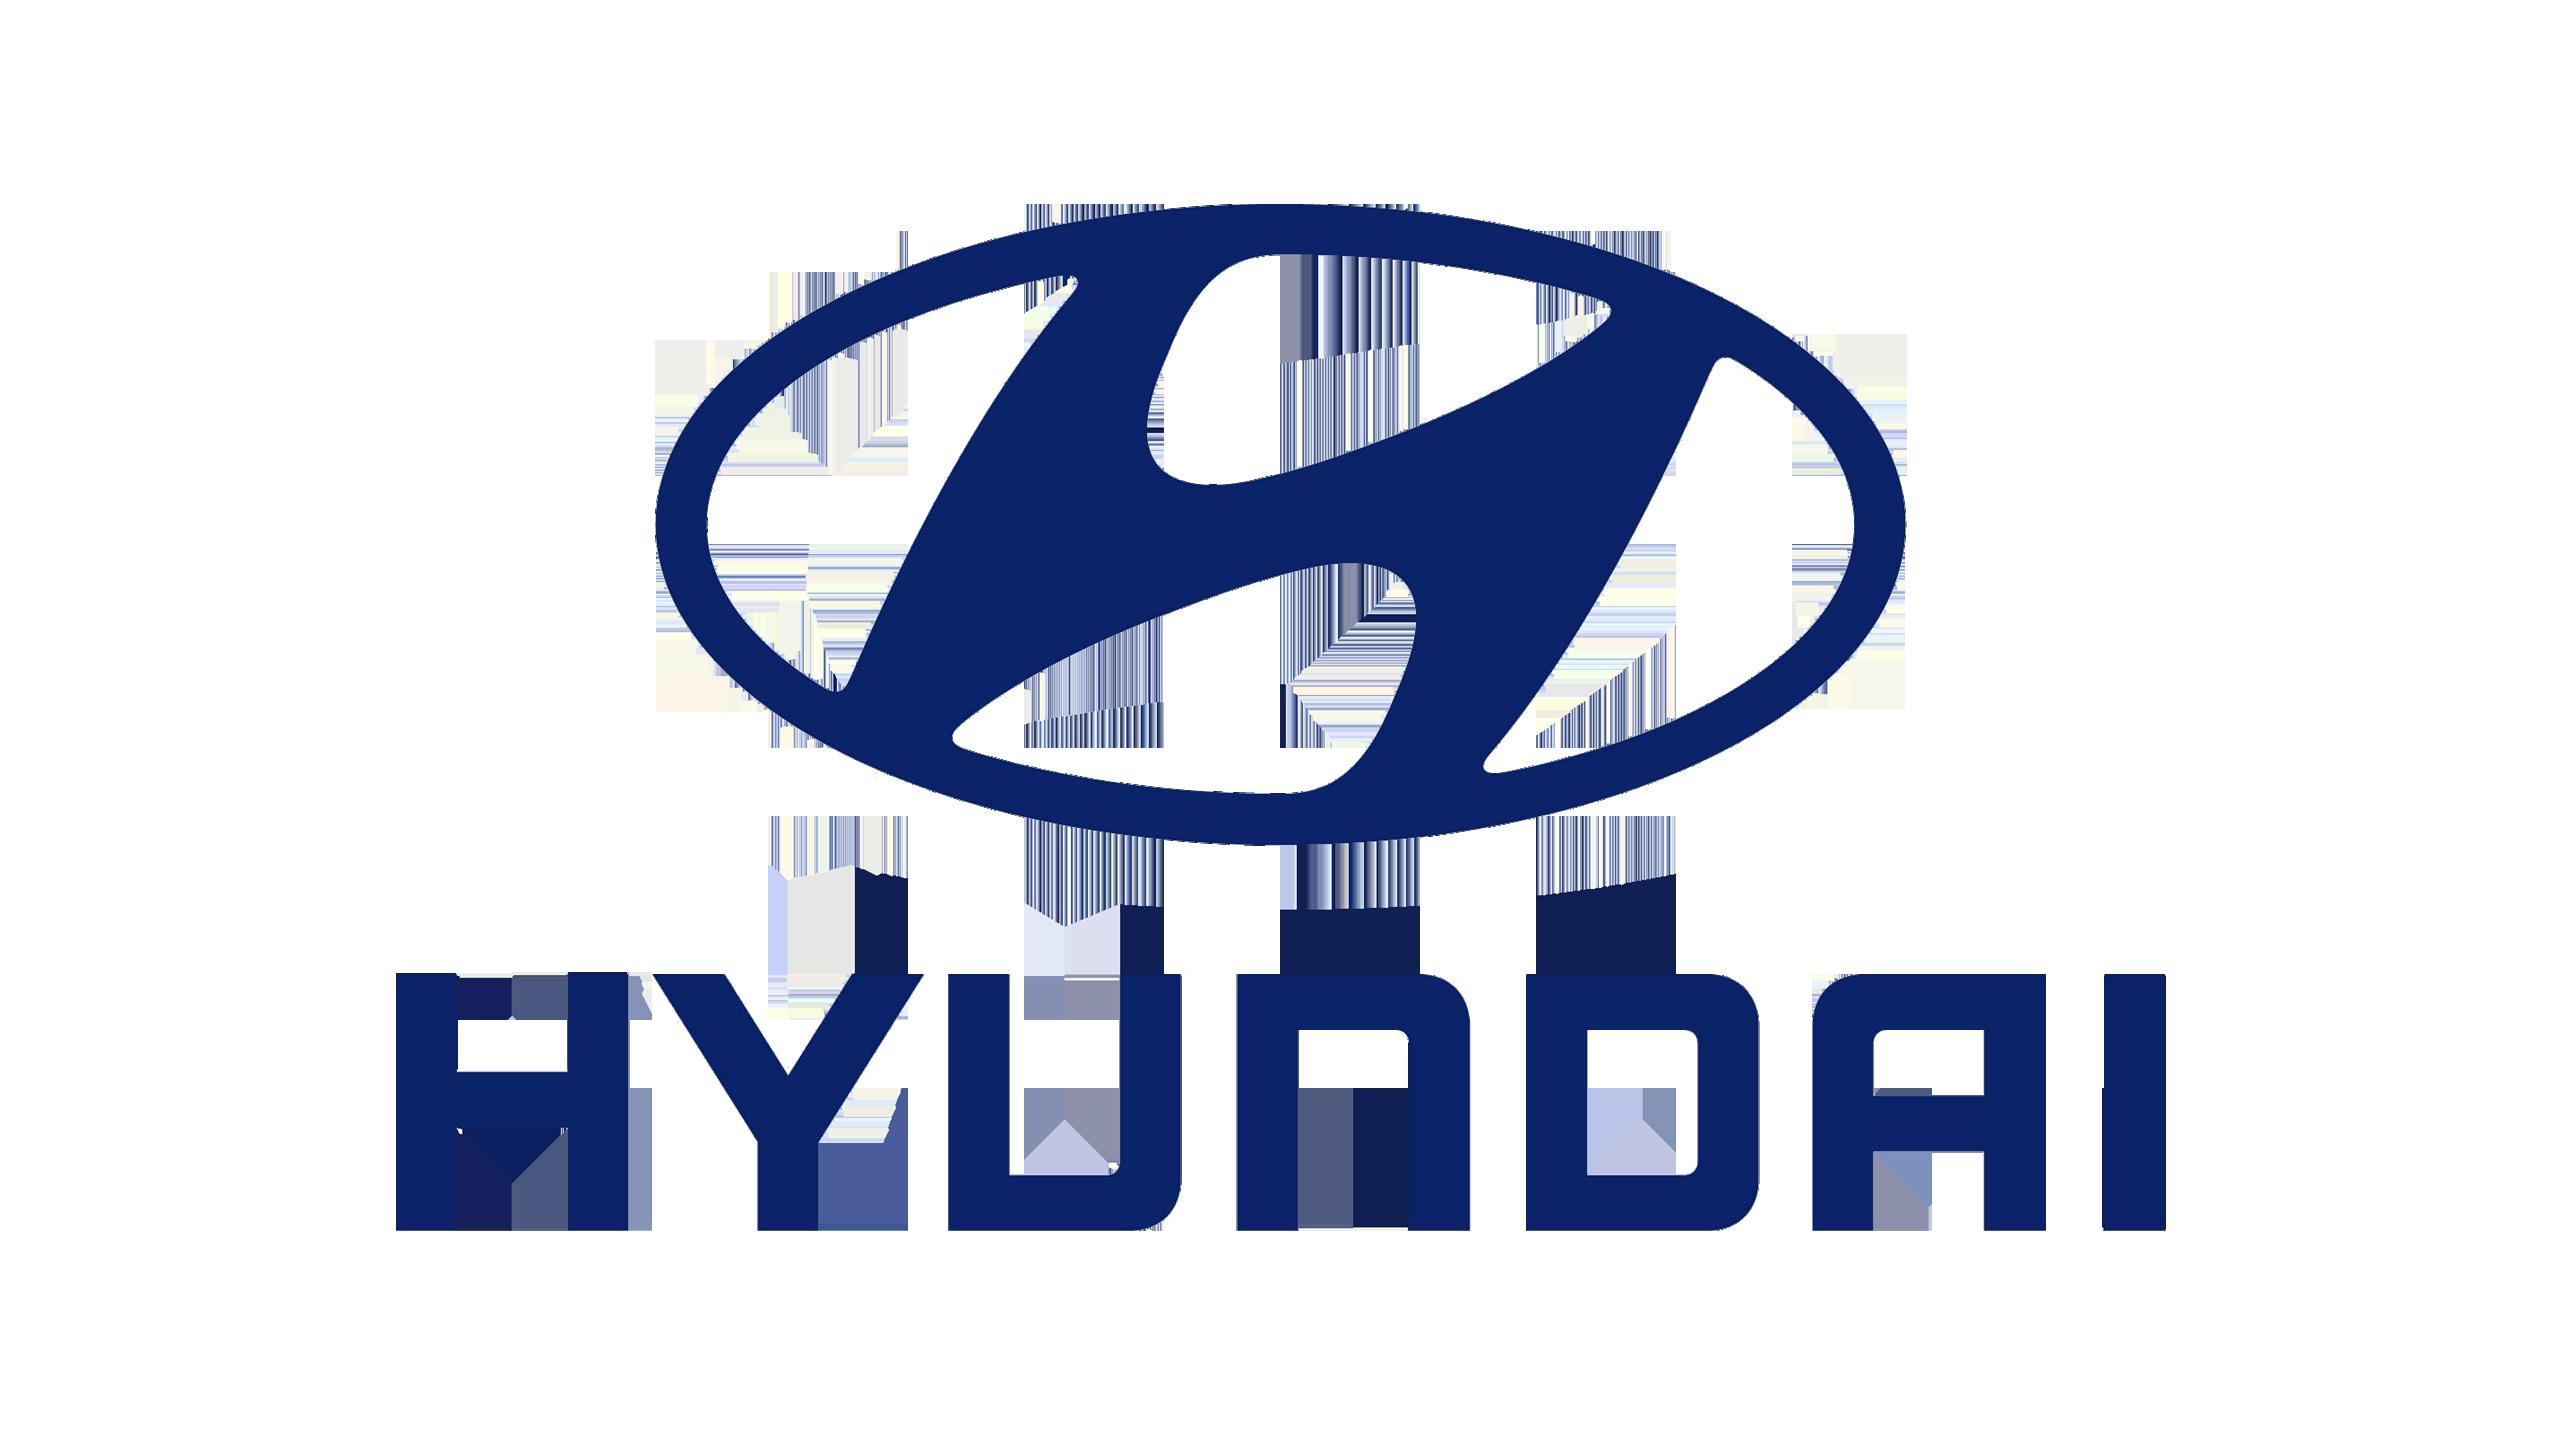 2560x1440 HD png - Hyundai Logo PNG